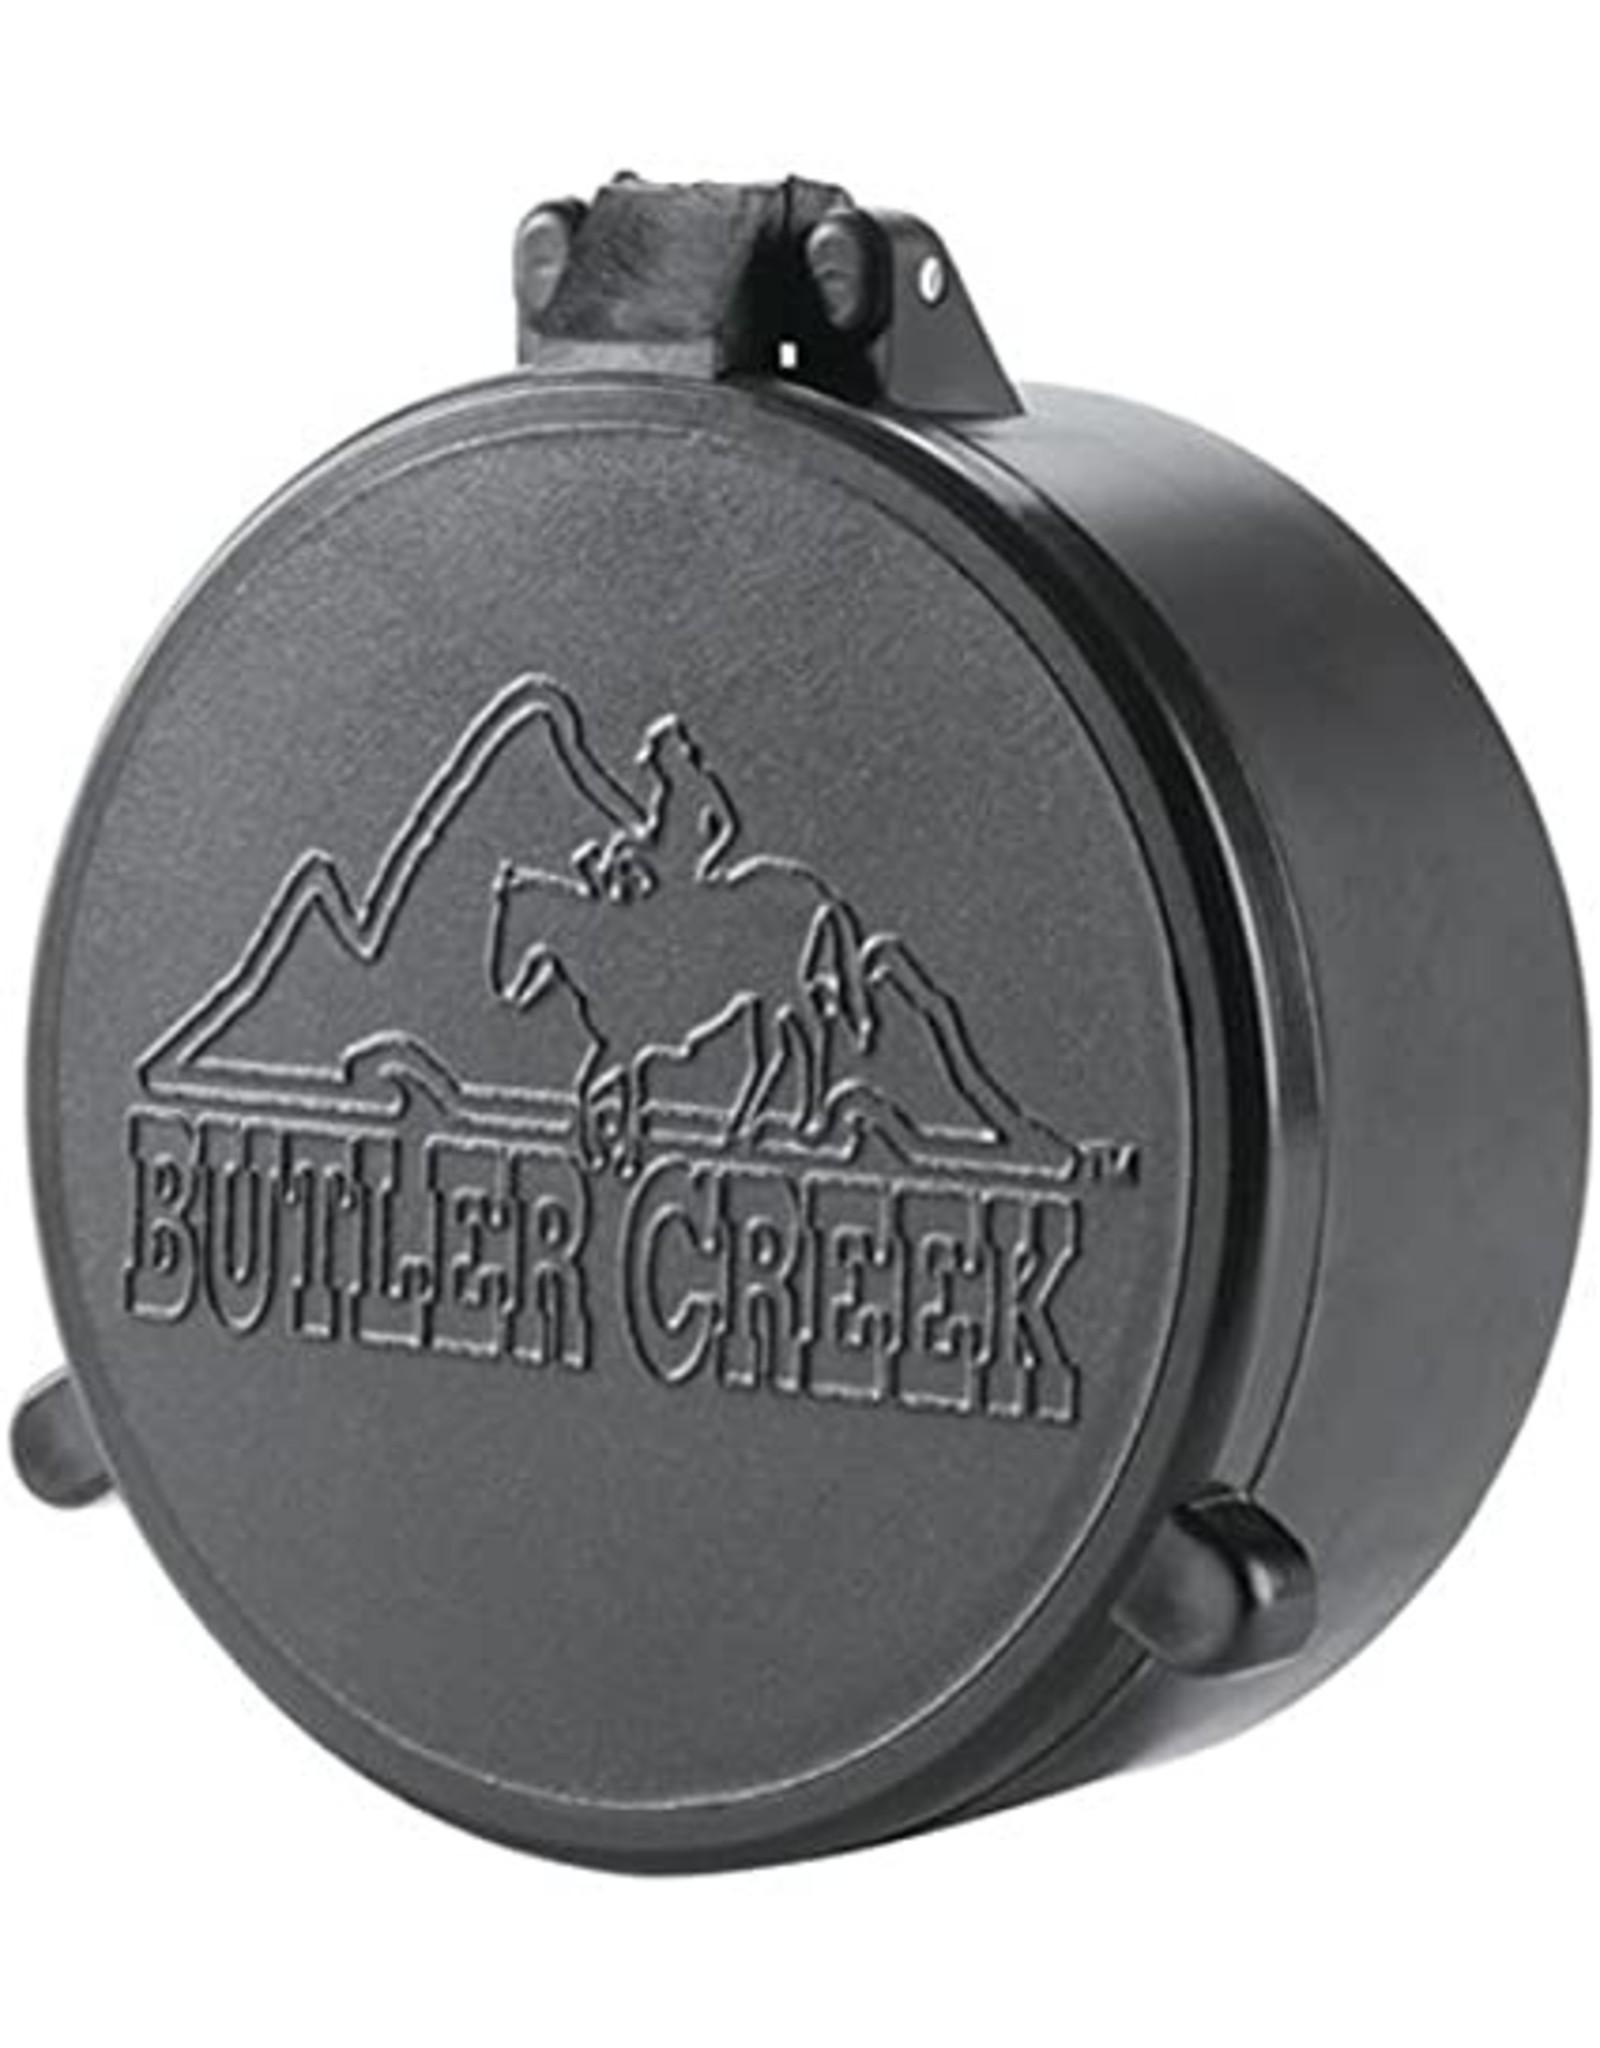 Butler Creek Butler Creek 40 OBJ Flip Open Scope Cover